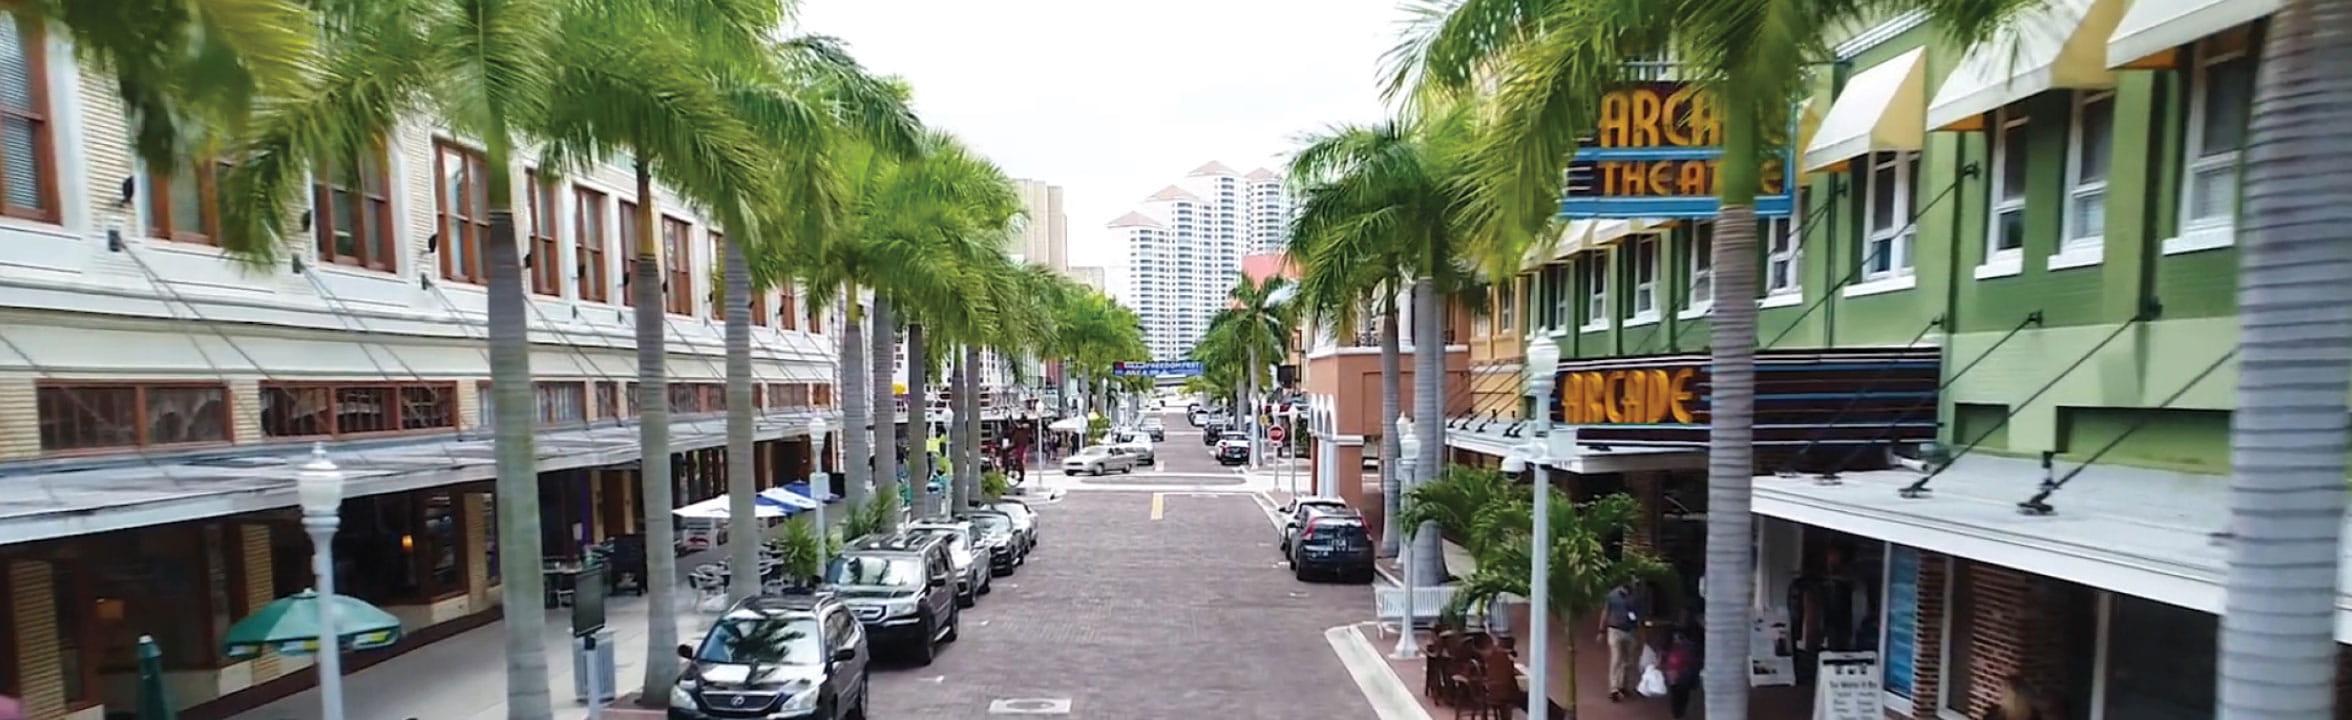 Fort Myers Florida skyline